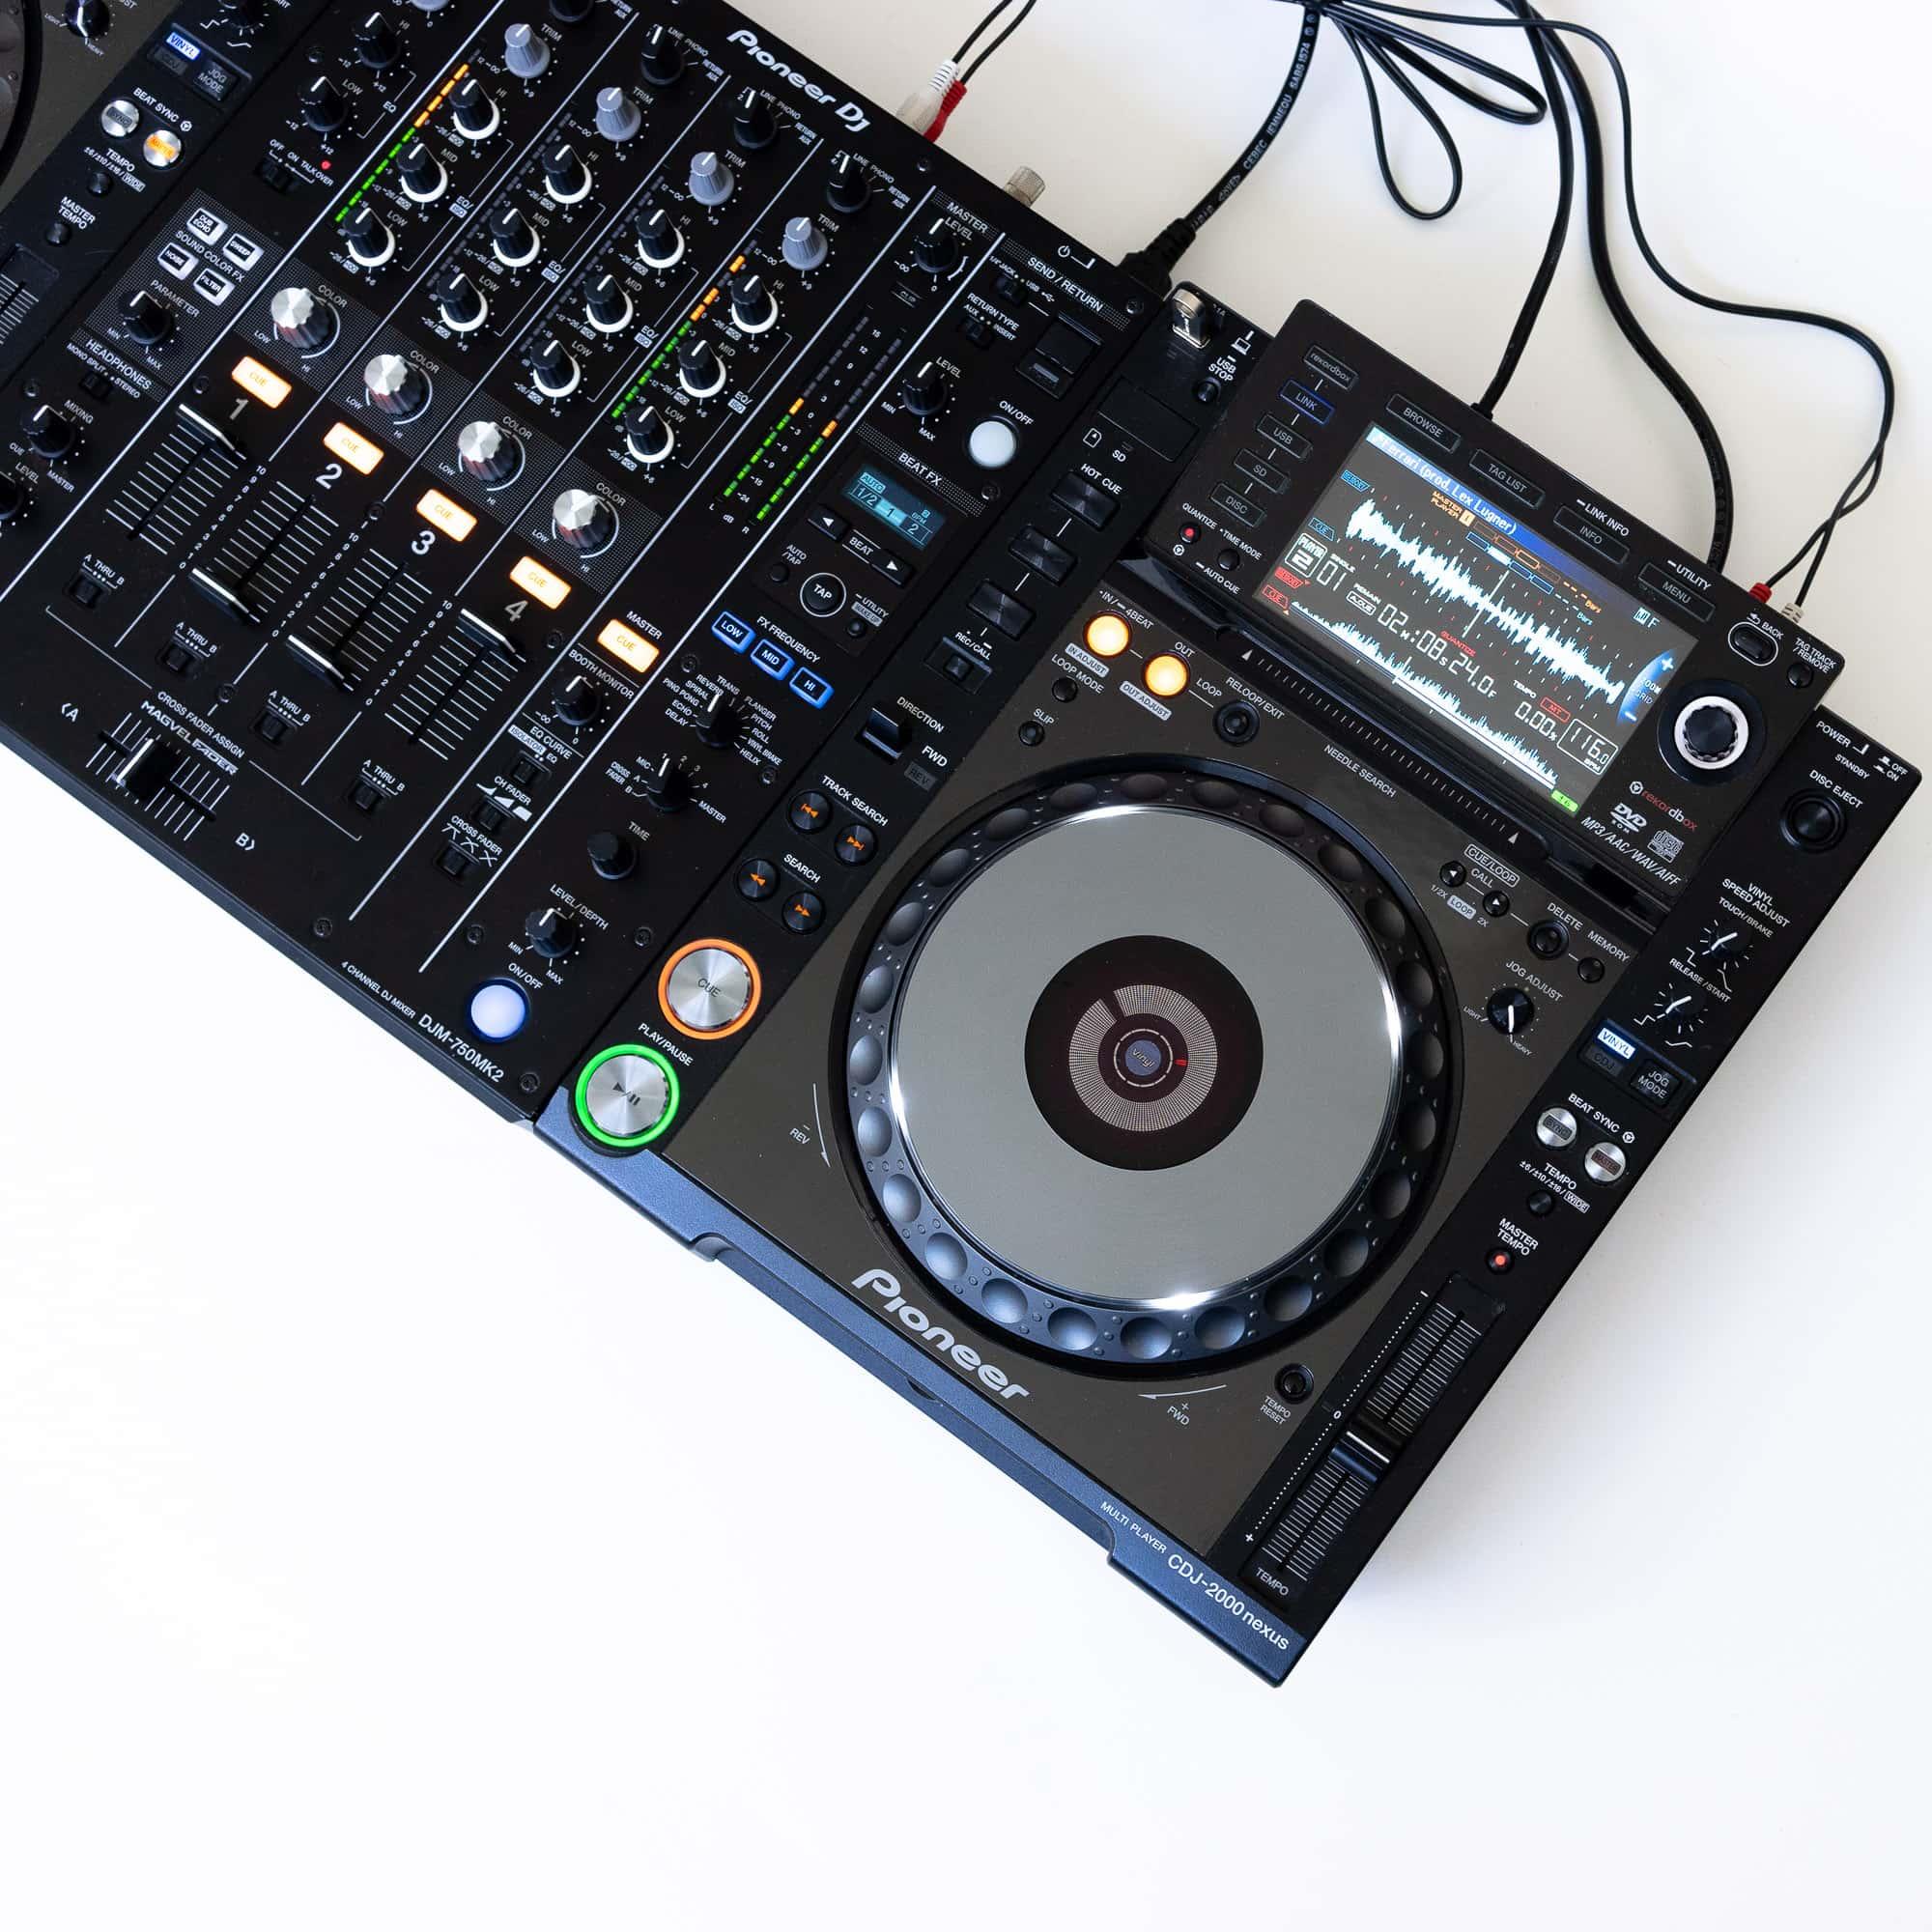 gebraucht kaufen DJ-Set: 2x Pioneer CDJ 2000 NXS2 Nexus + 1x Pioneer DJM 750 MK2